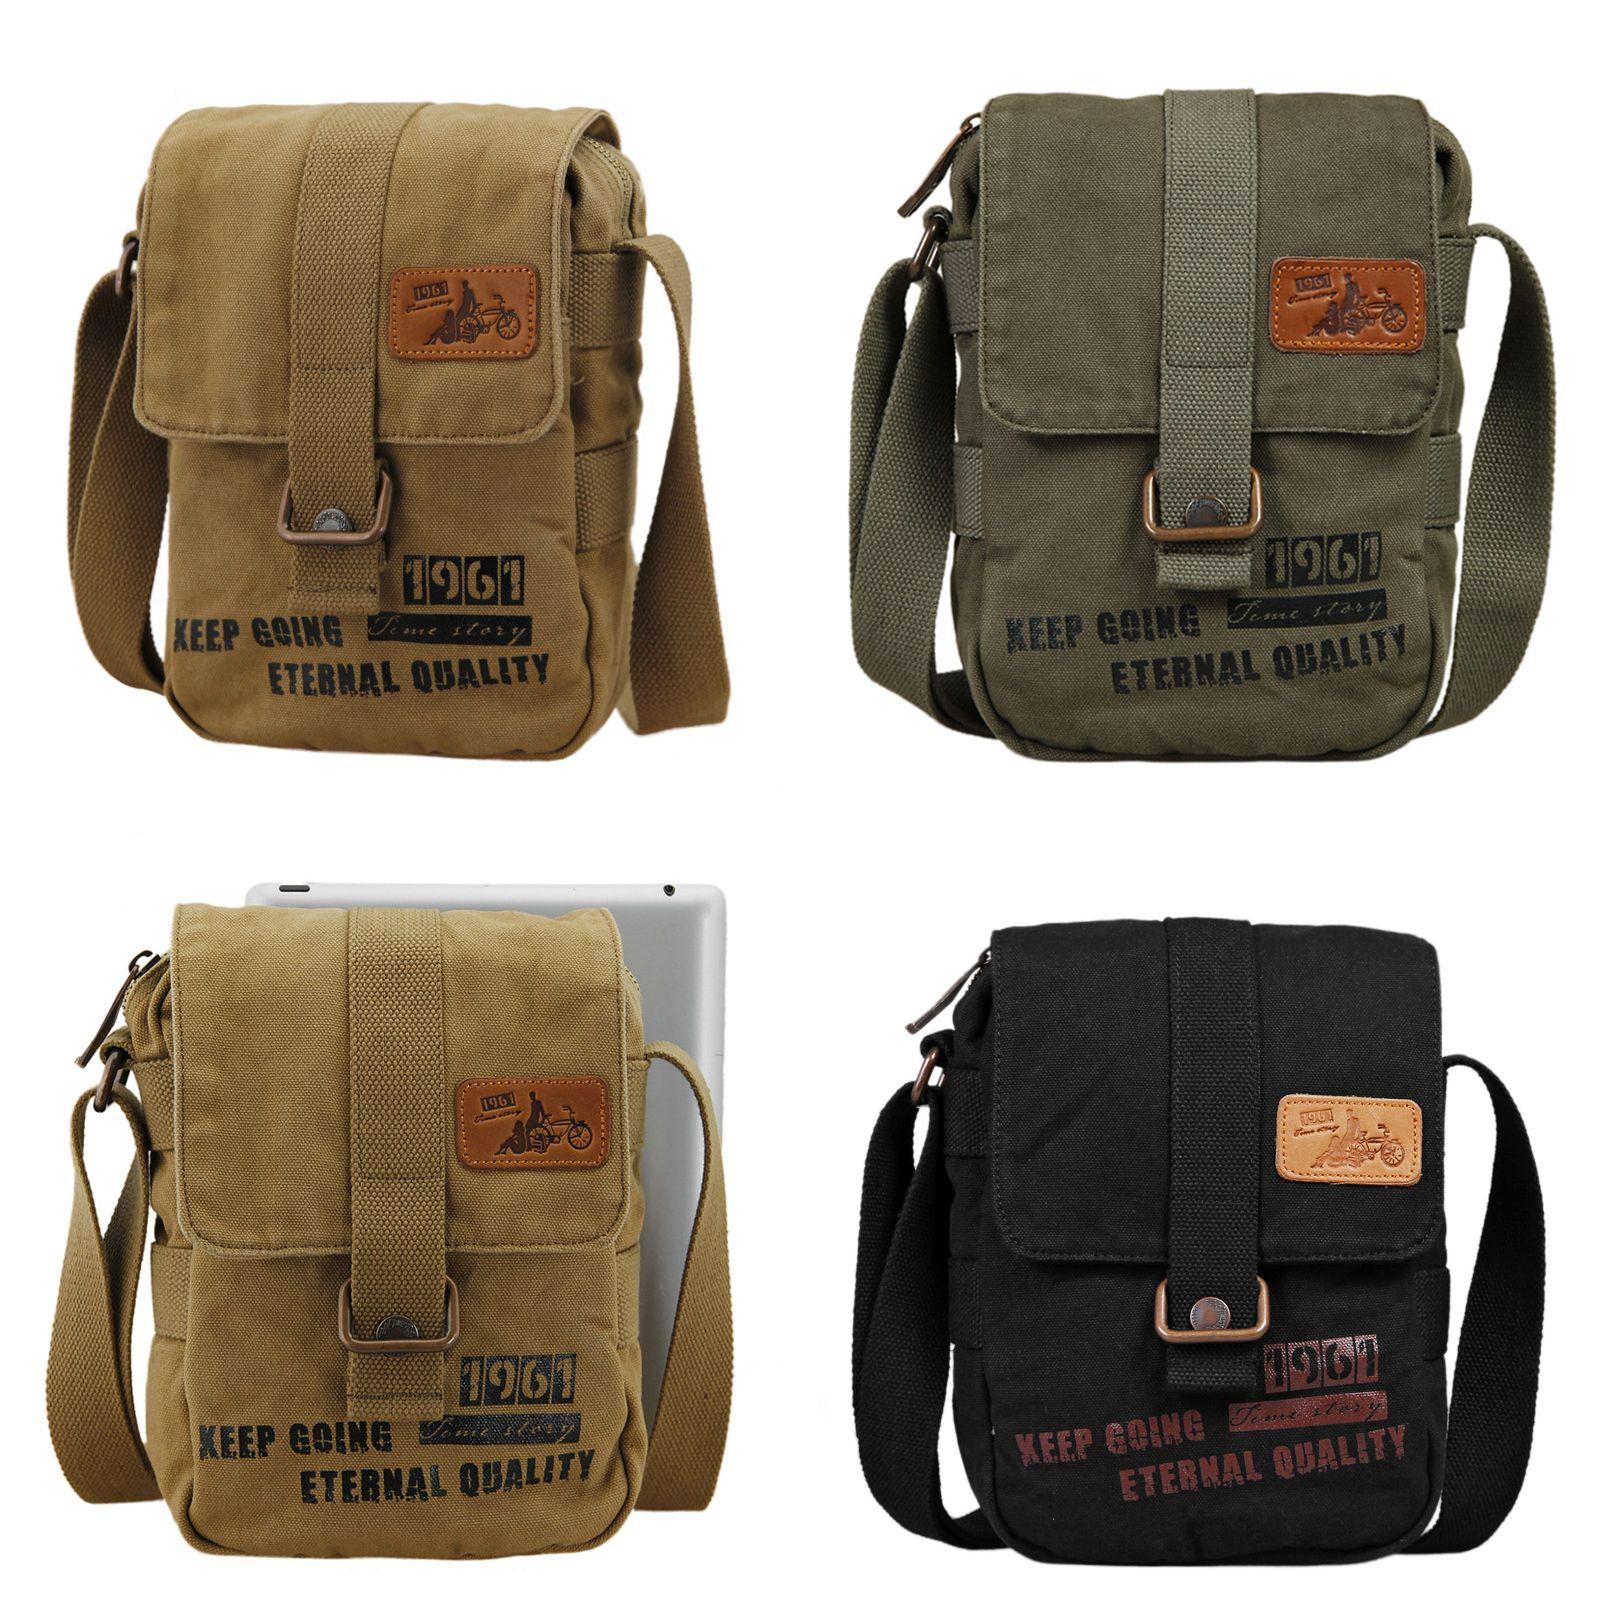 6d12f6aa56ad 26   BEST QUALITY Men s Womens Casual Canvas Messenger Shoulder Bag School  Satchel Sling Bag (GY04)  Canvas  bag  casual  vintage  fashion